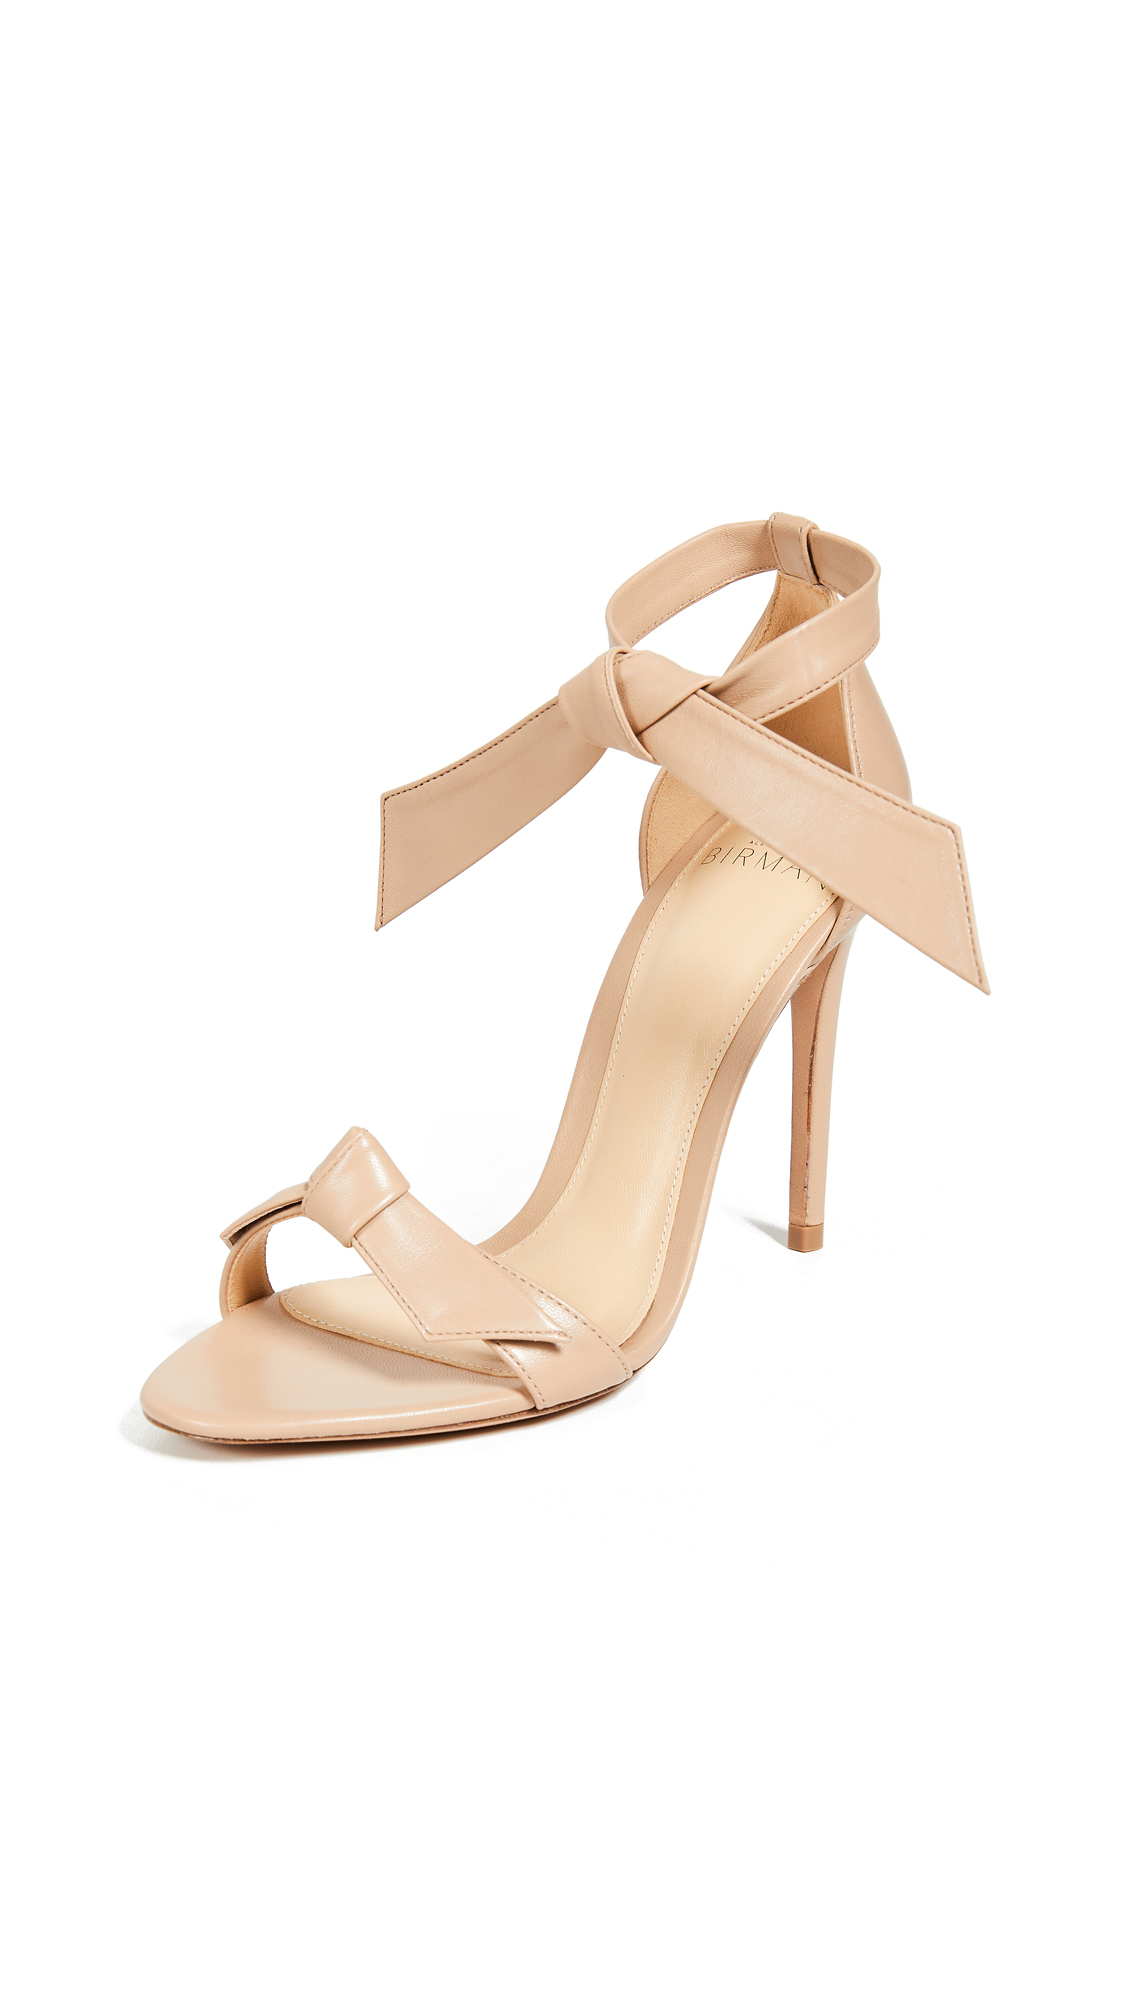 Alexandre Birman Clarita Sandals - Nude